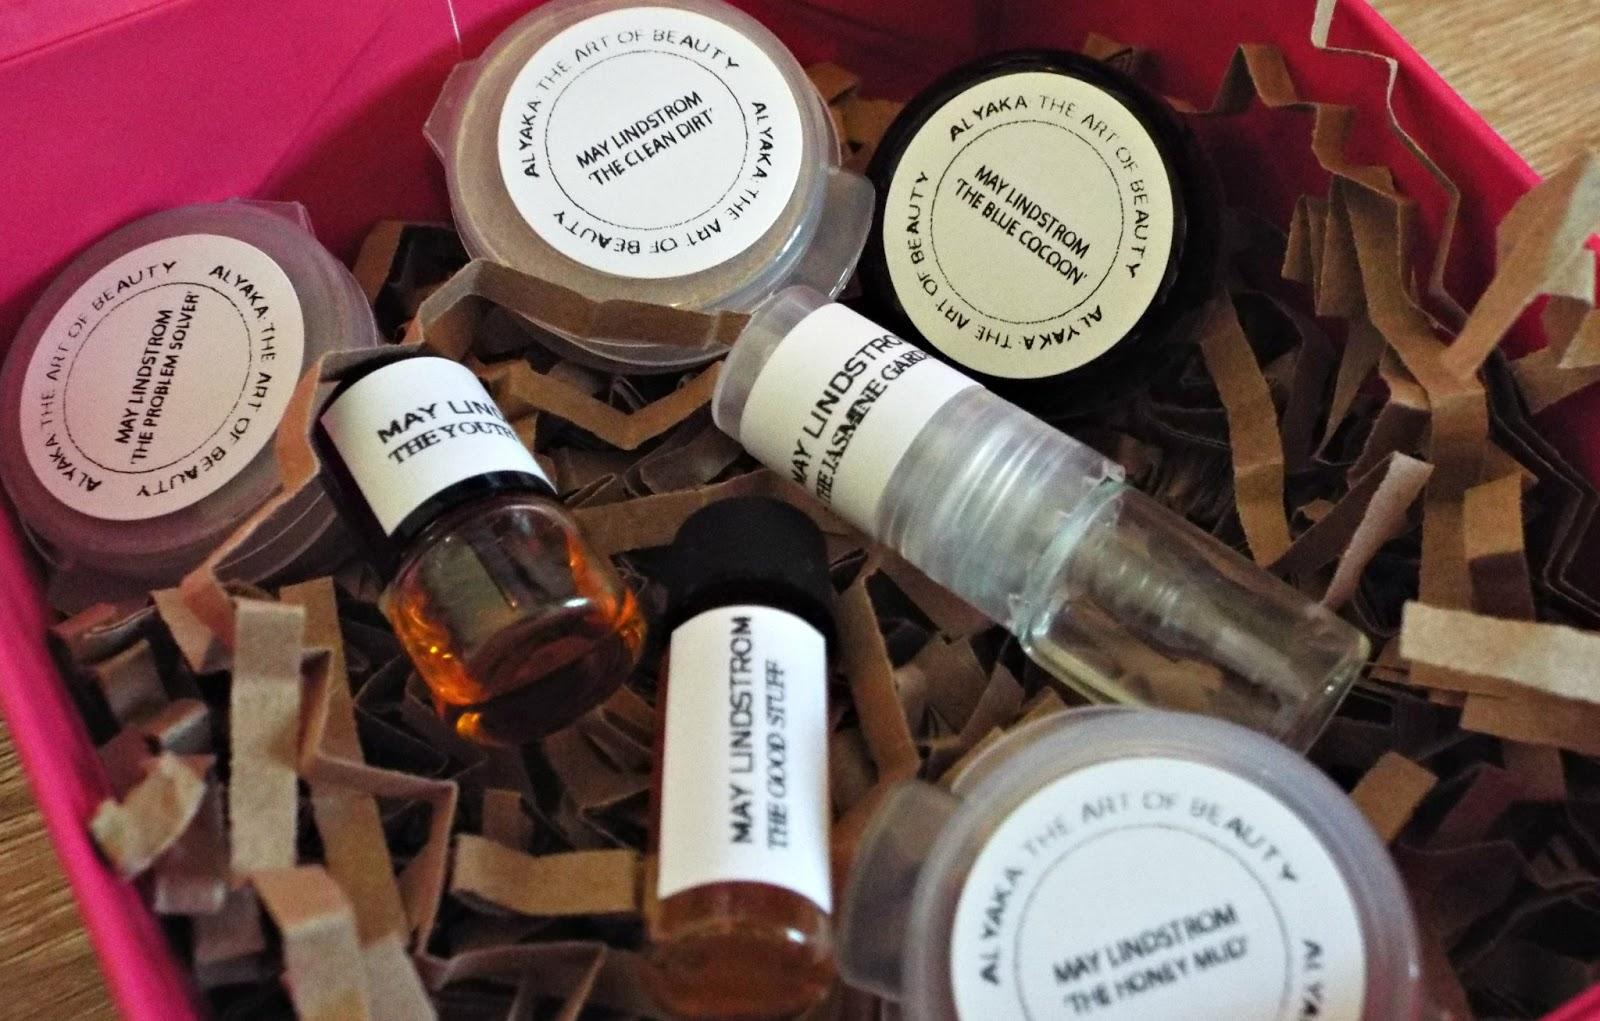 May Lindstrom Sample Box   Lippy in London - UK Beauty Blog